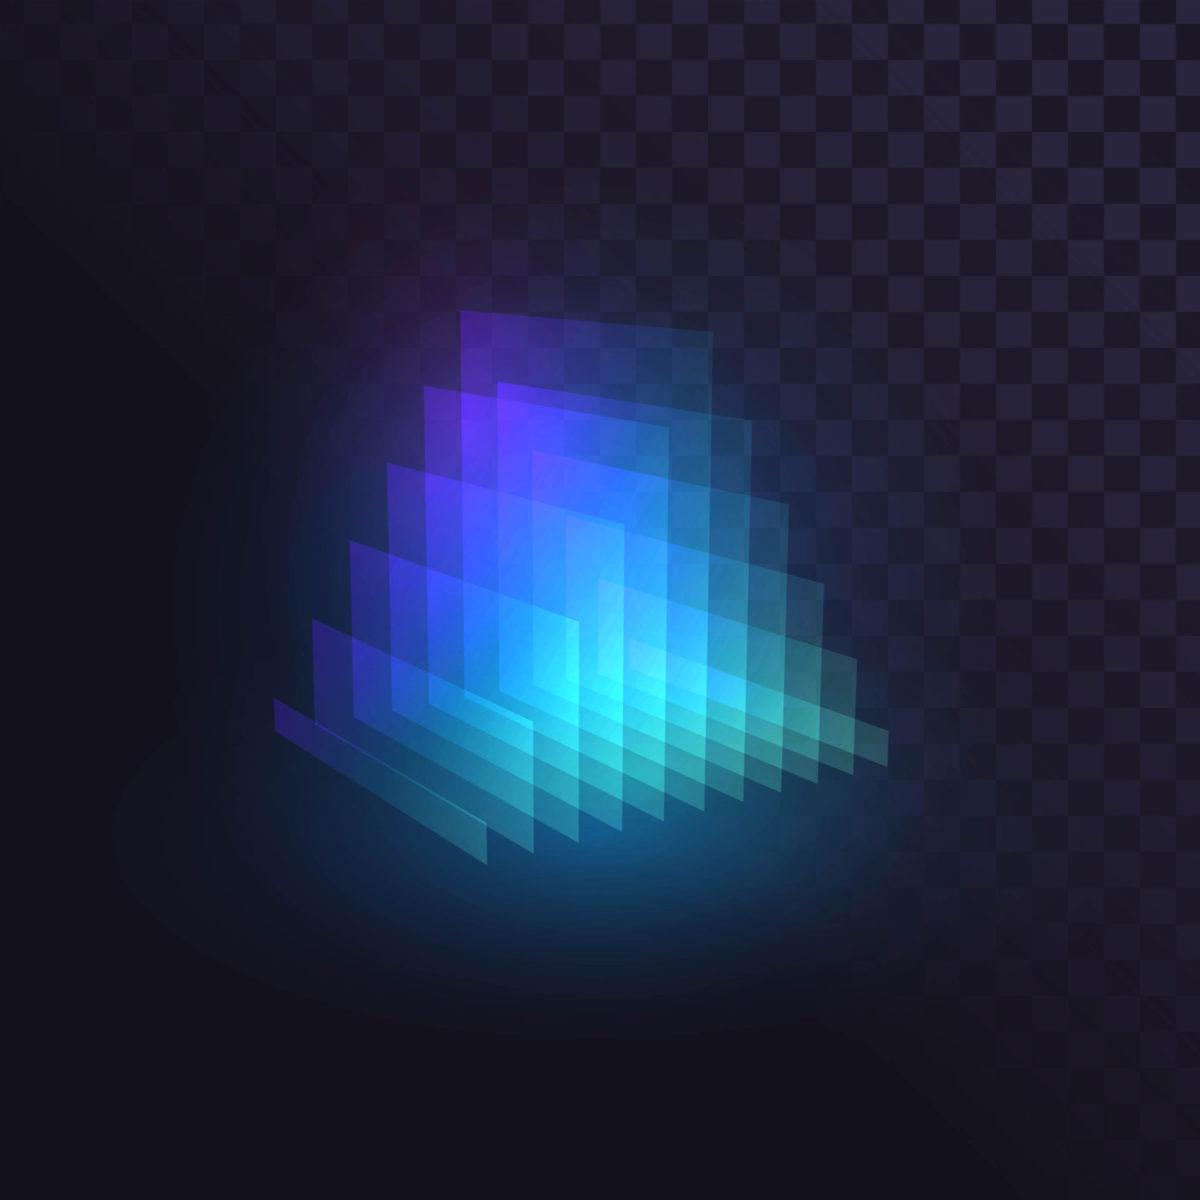 Glowing blue prism